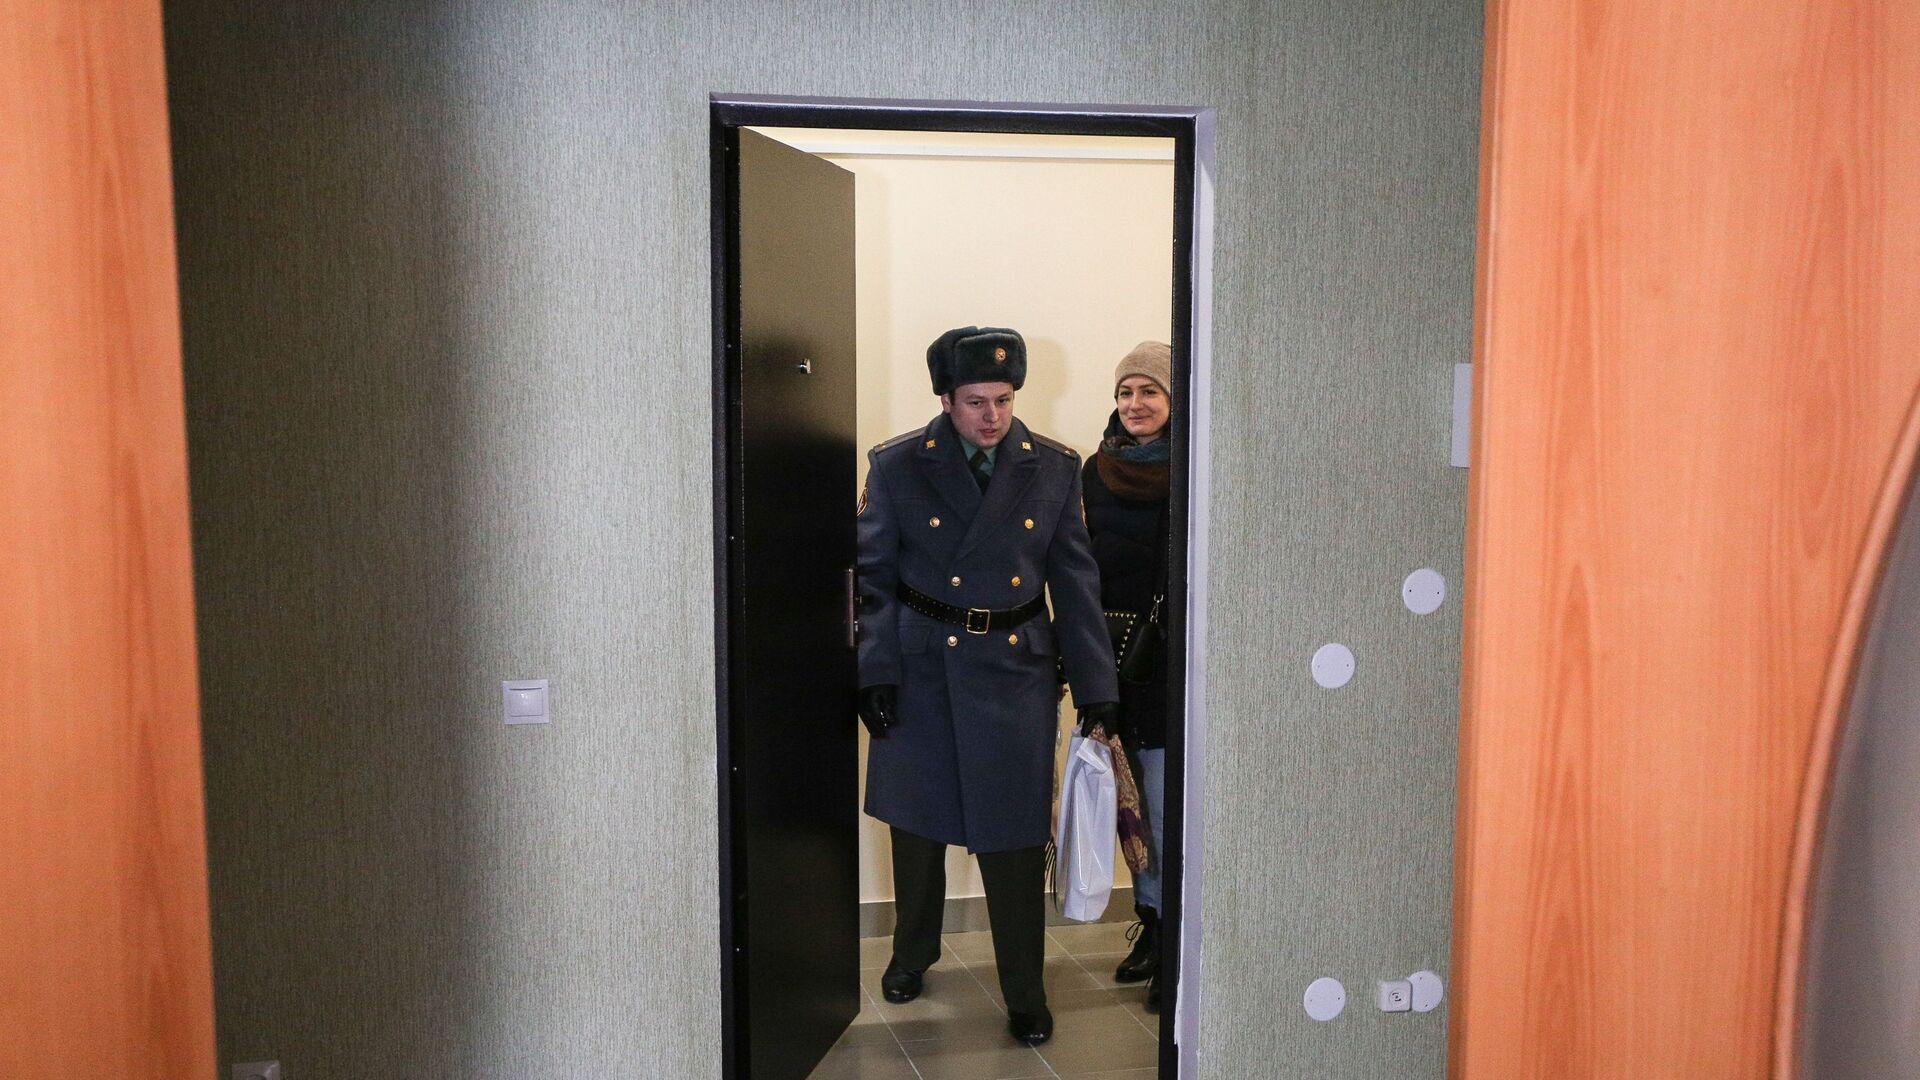 Новоселы заходят в новую квартиру - РИА Новости, 1920, 17.03.2021